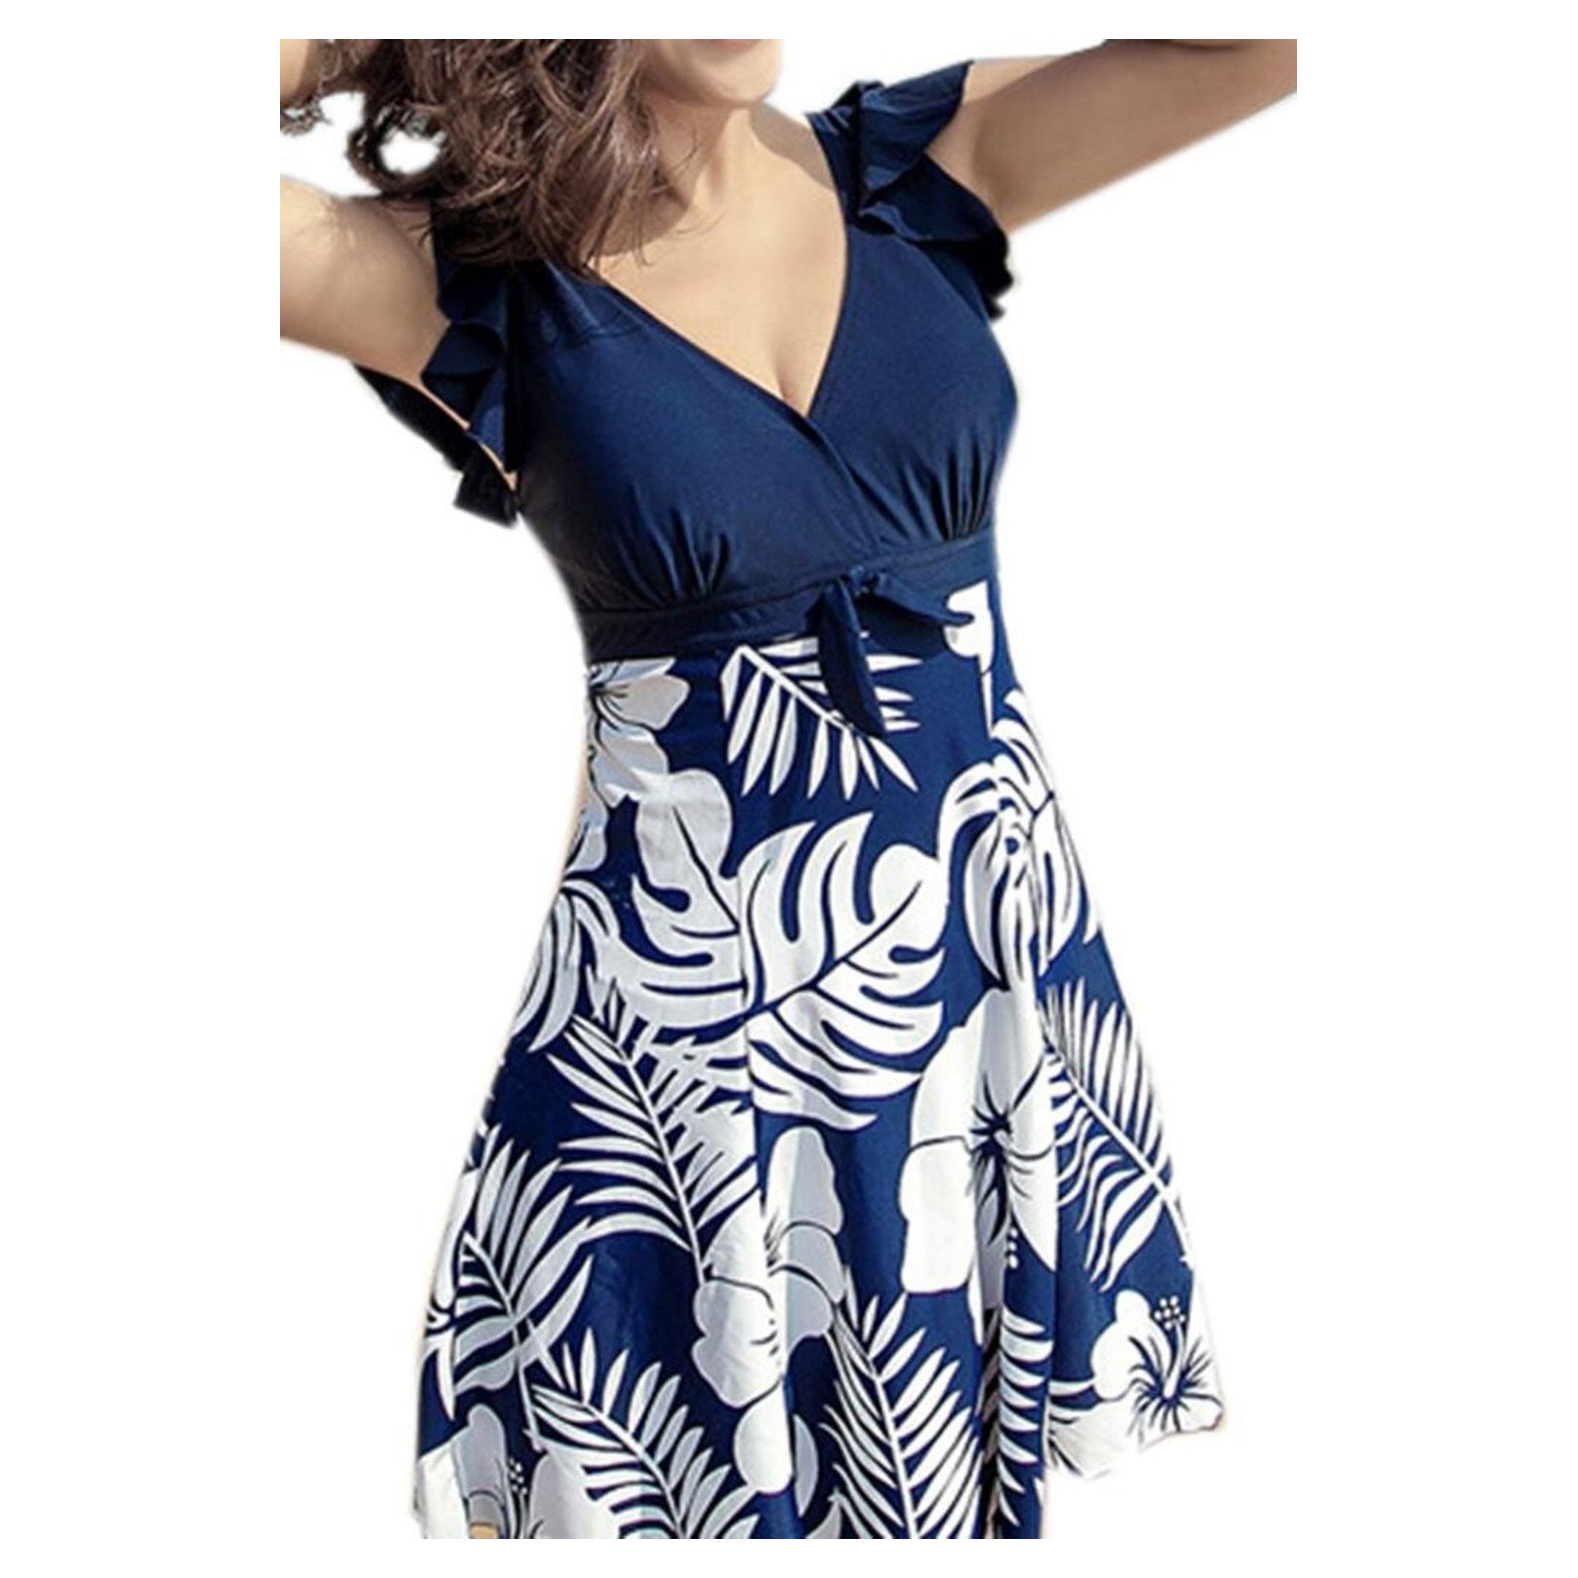 Hot Women's Halter Shaping Body One-Piece Swimsuit Plus Size Swimwear Navy Blue XL color block halter shaping one piece swimwear